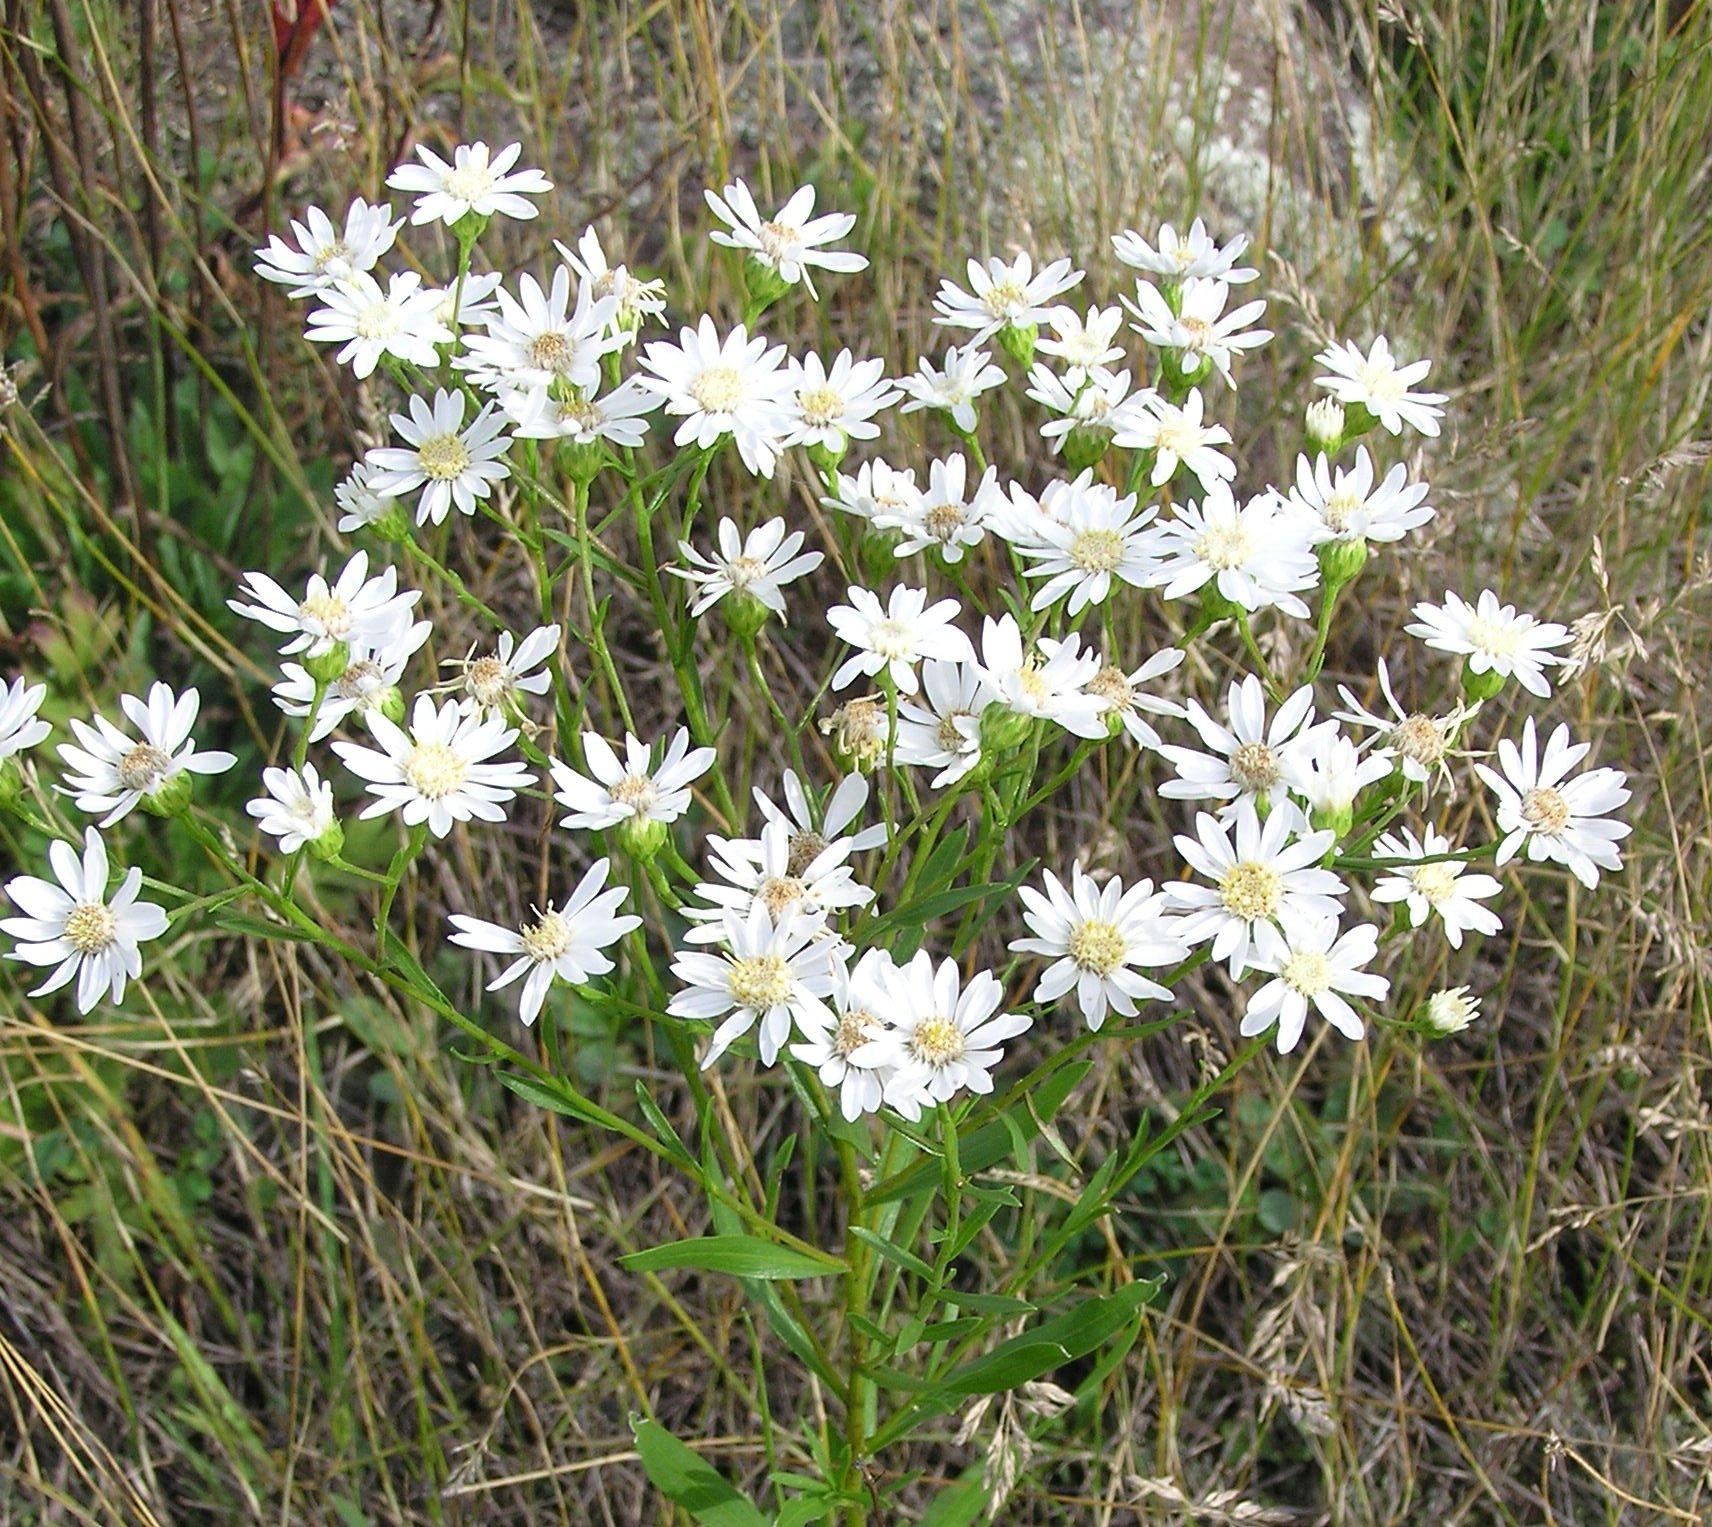 Upland White Goldenrod